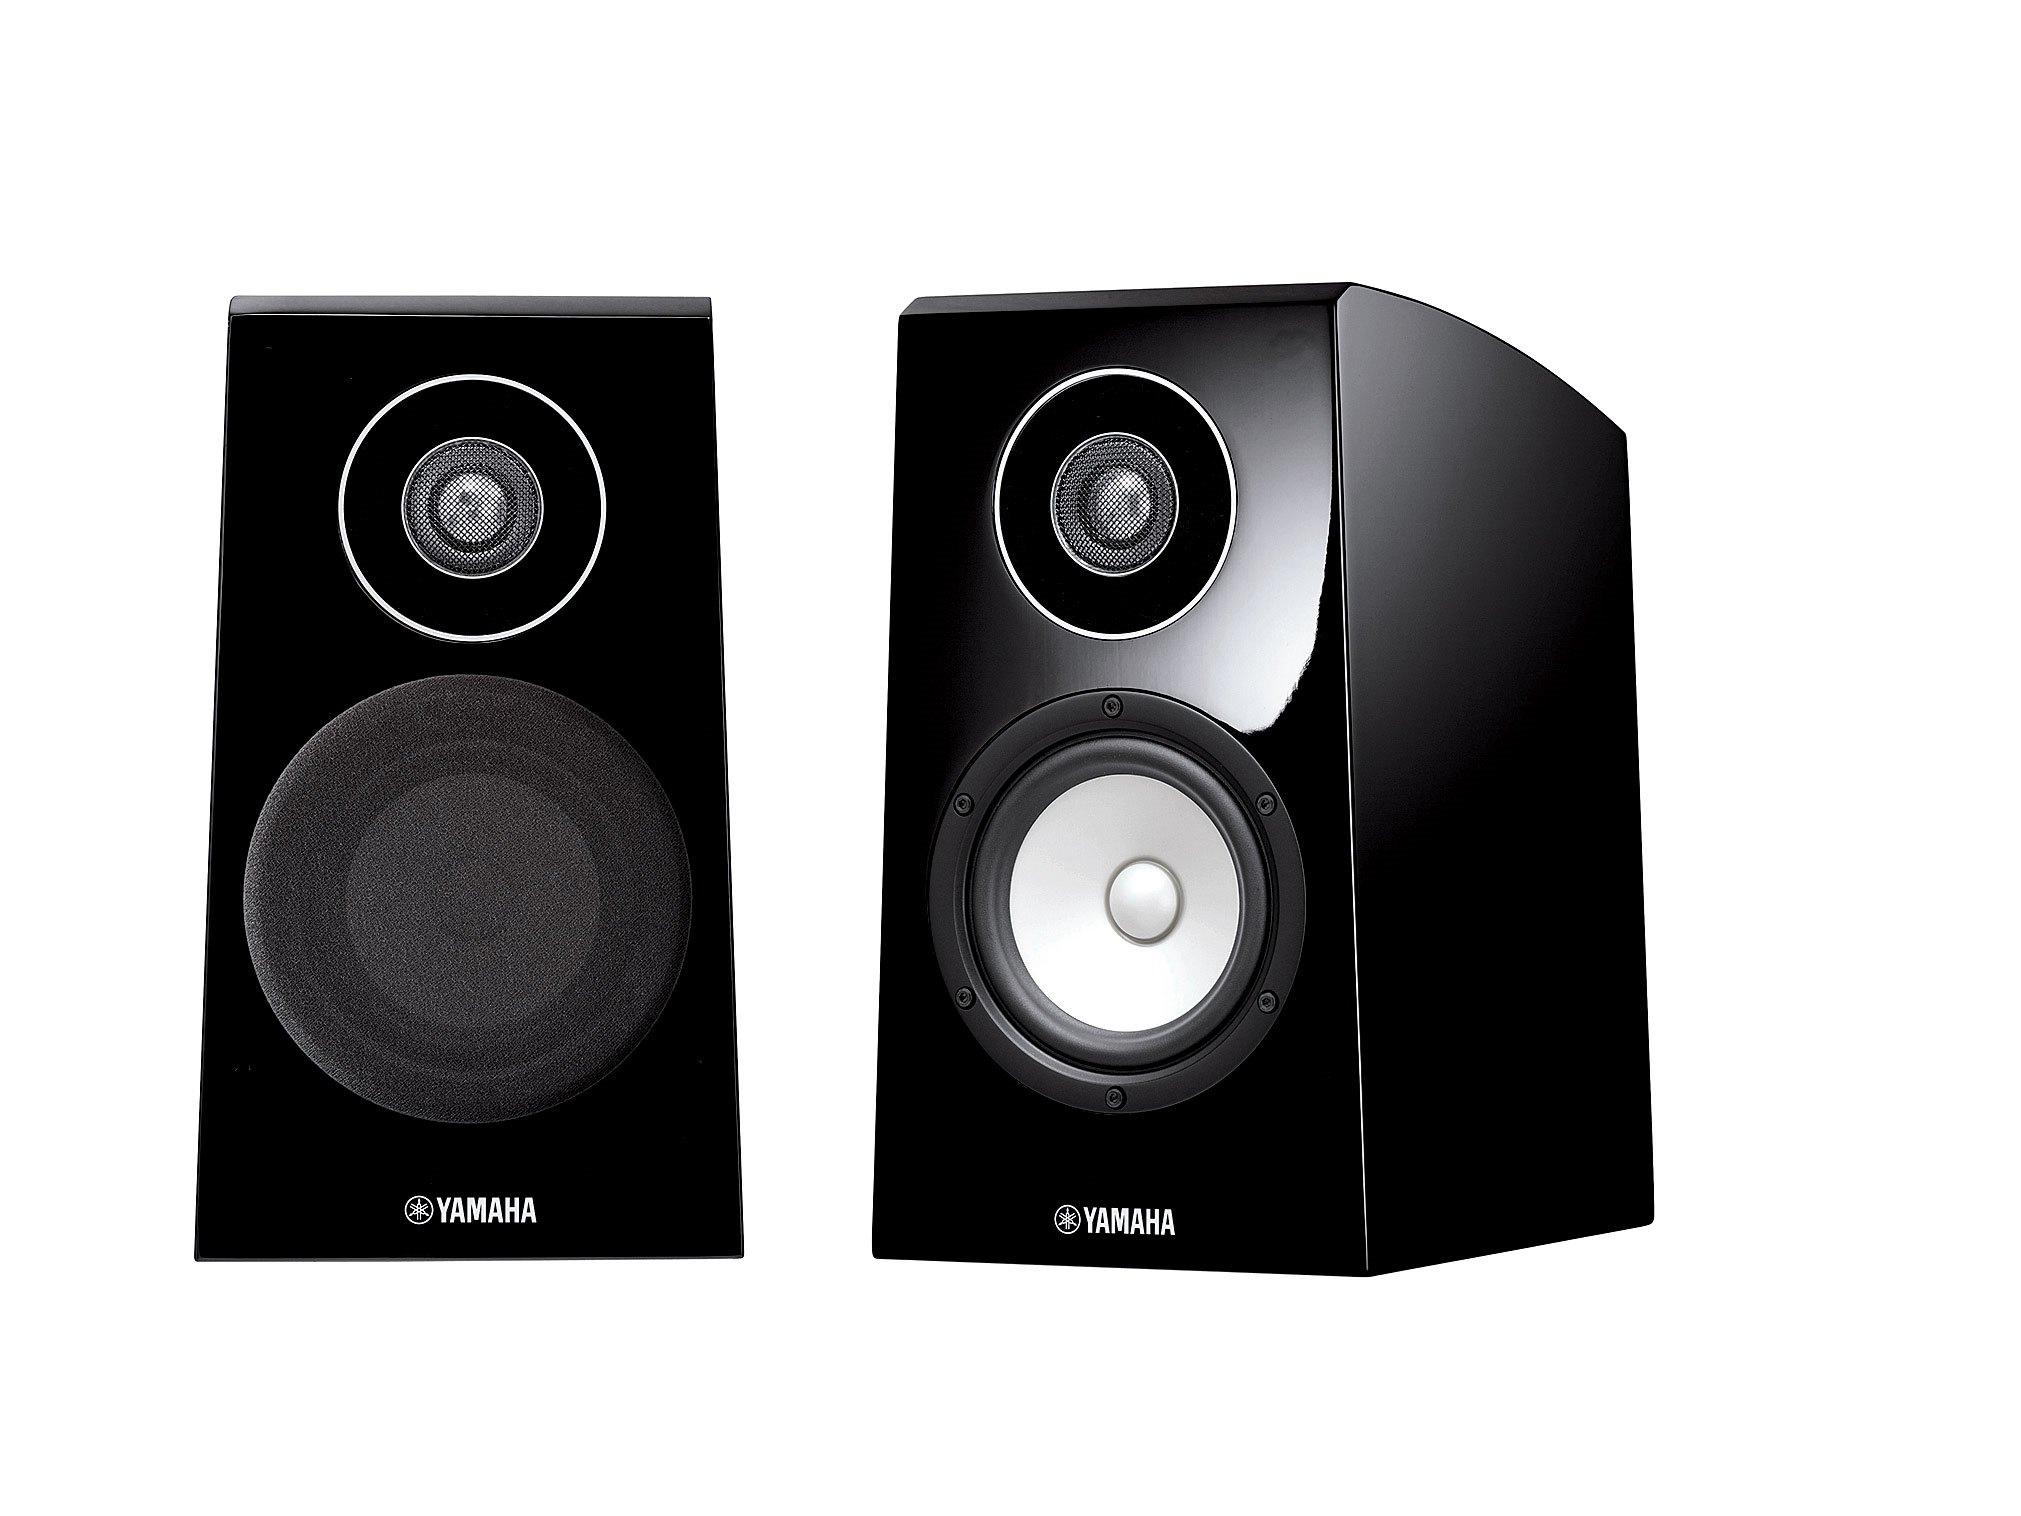 3e5a679409b110 Diffusori / Subwoofer - Audio & Video - Prodotti - Yamaha - Italia